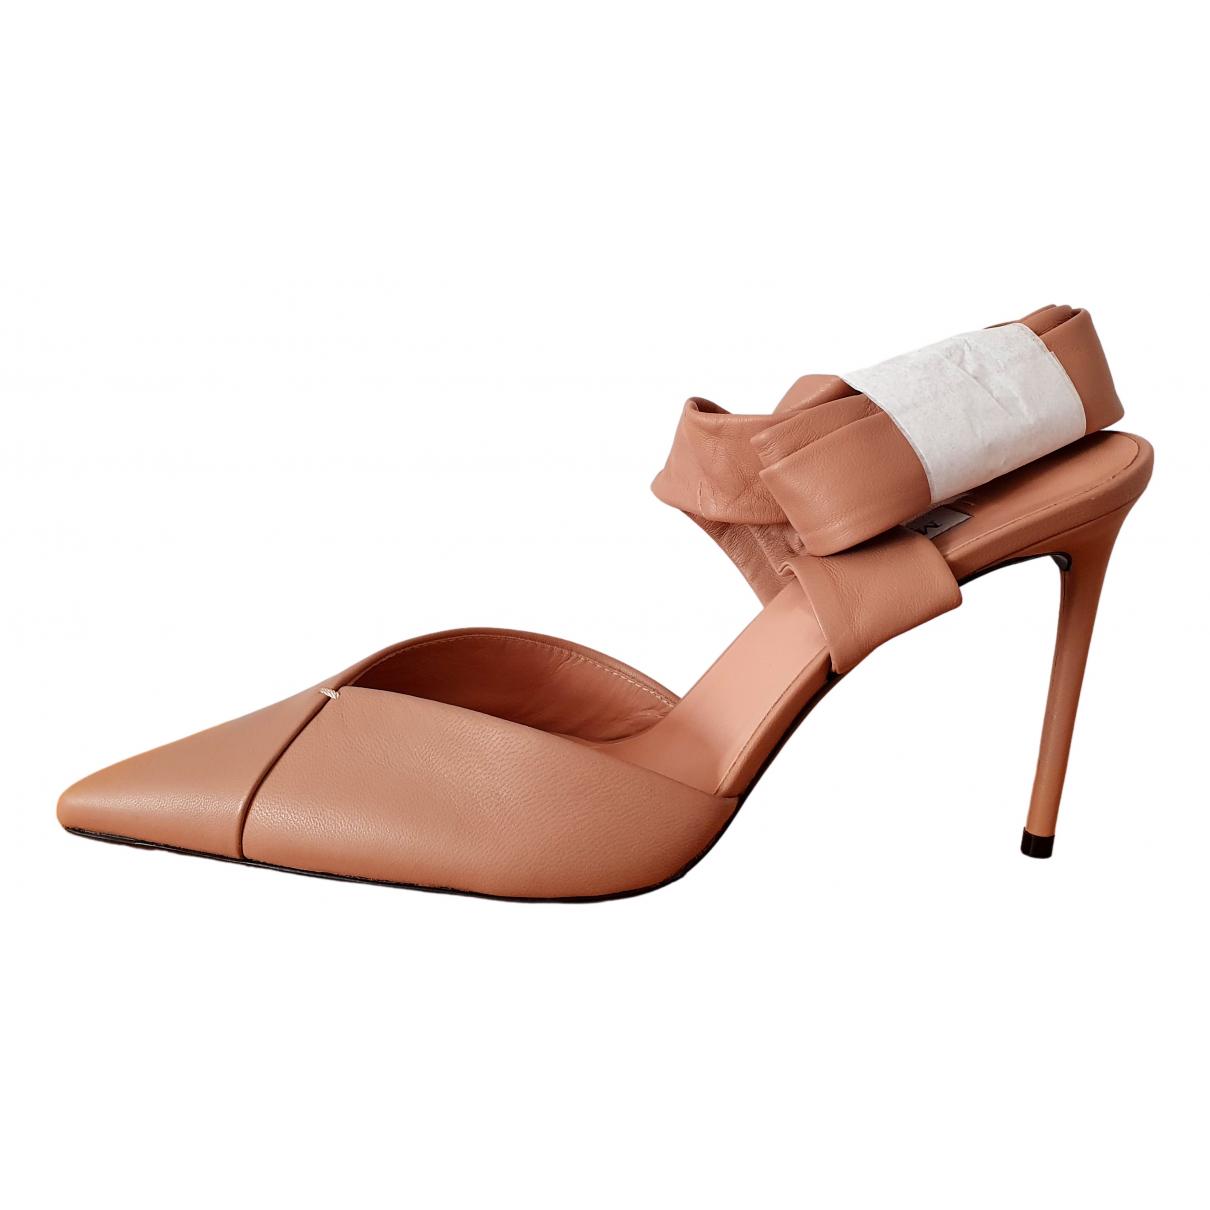 Sandalias de Cuero Max Mara